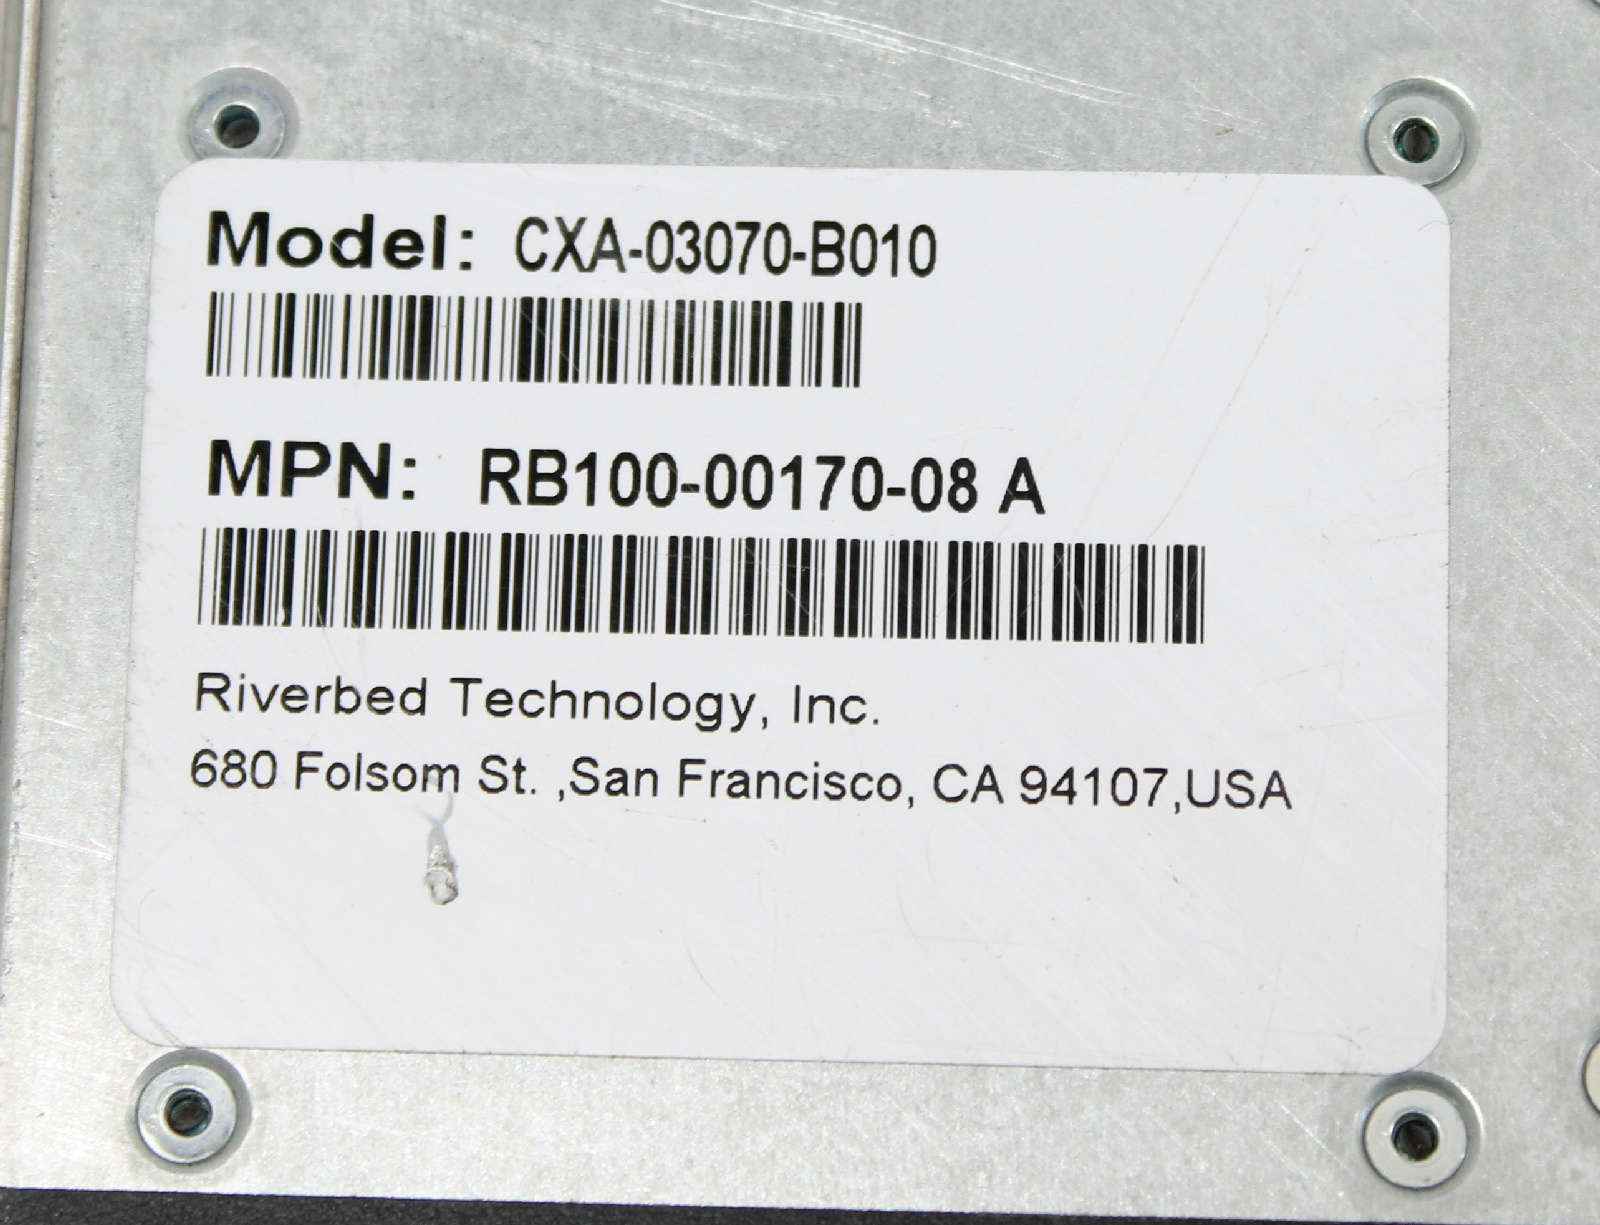 Riverbed SteelHead CX3070 Application Accelerator / M License /  CXA-03070-B010